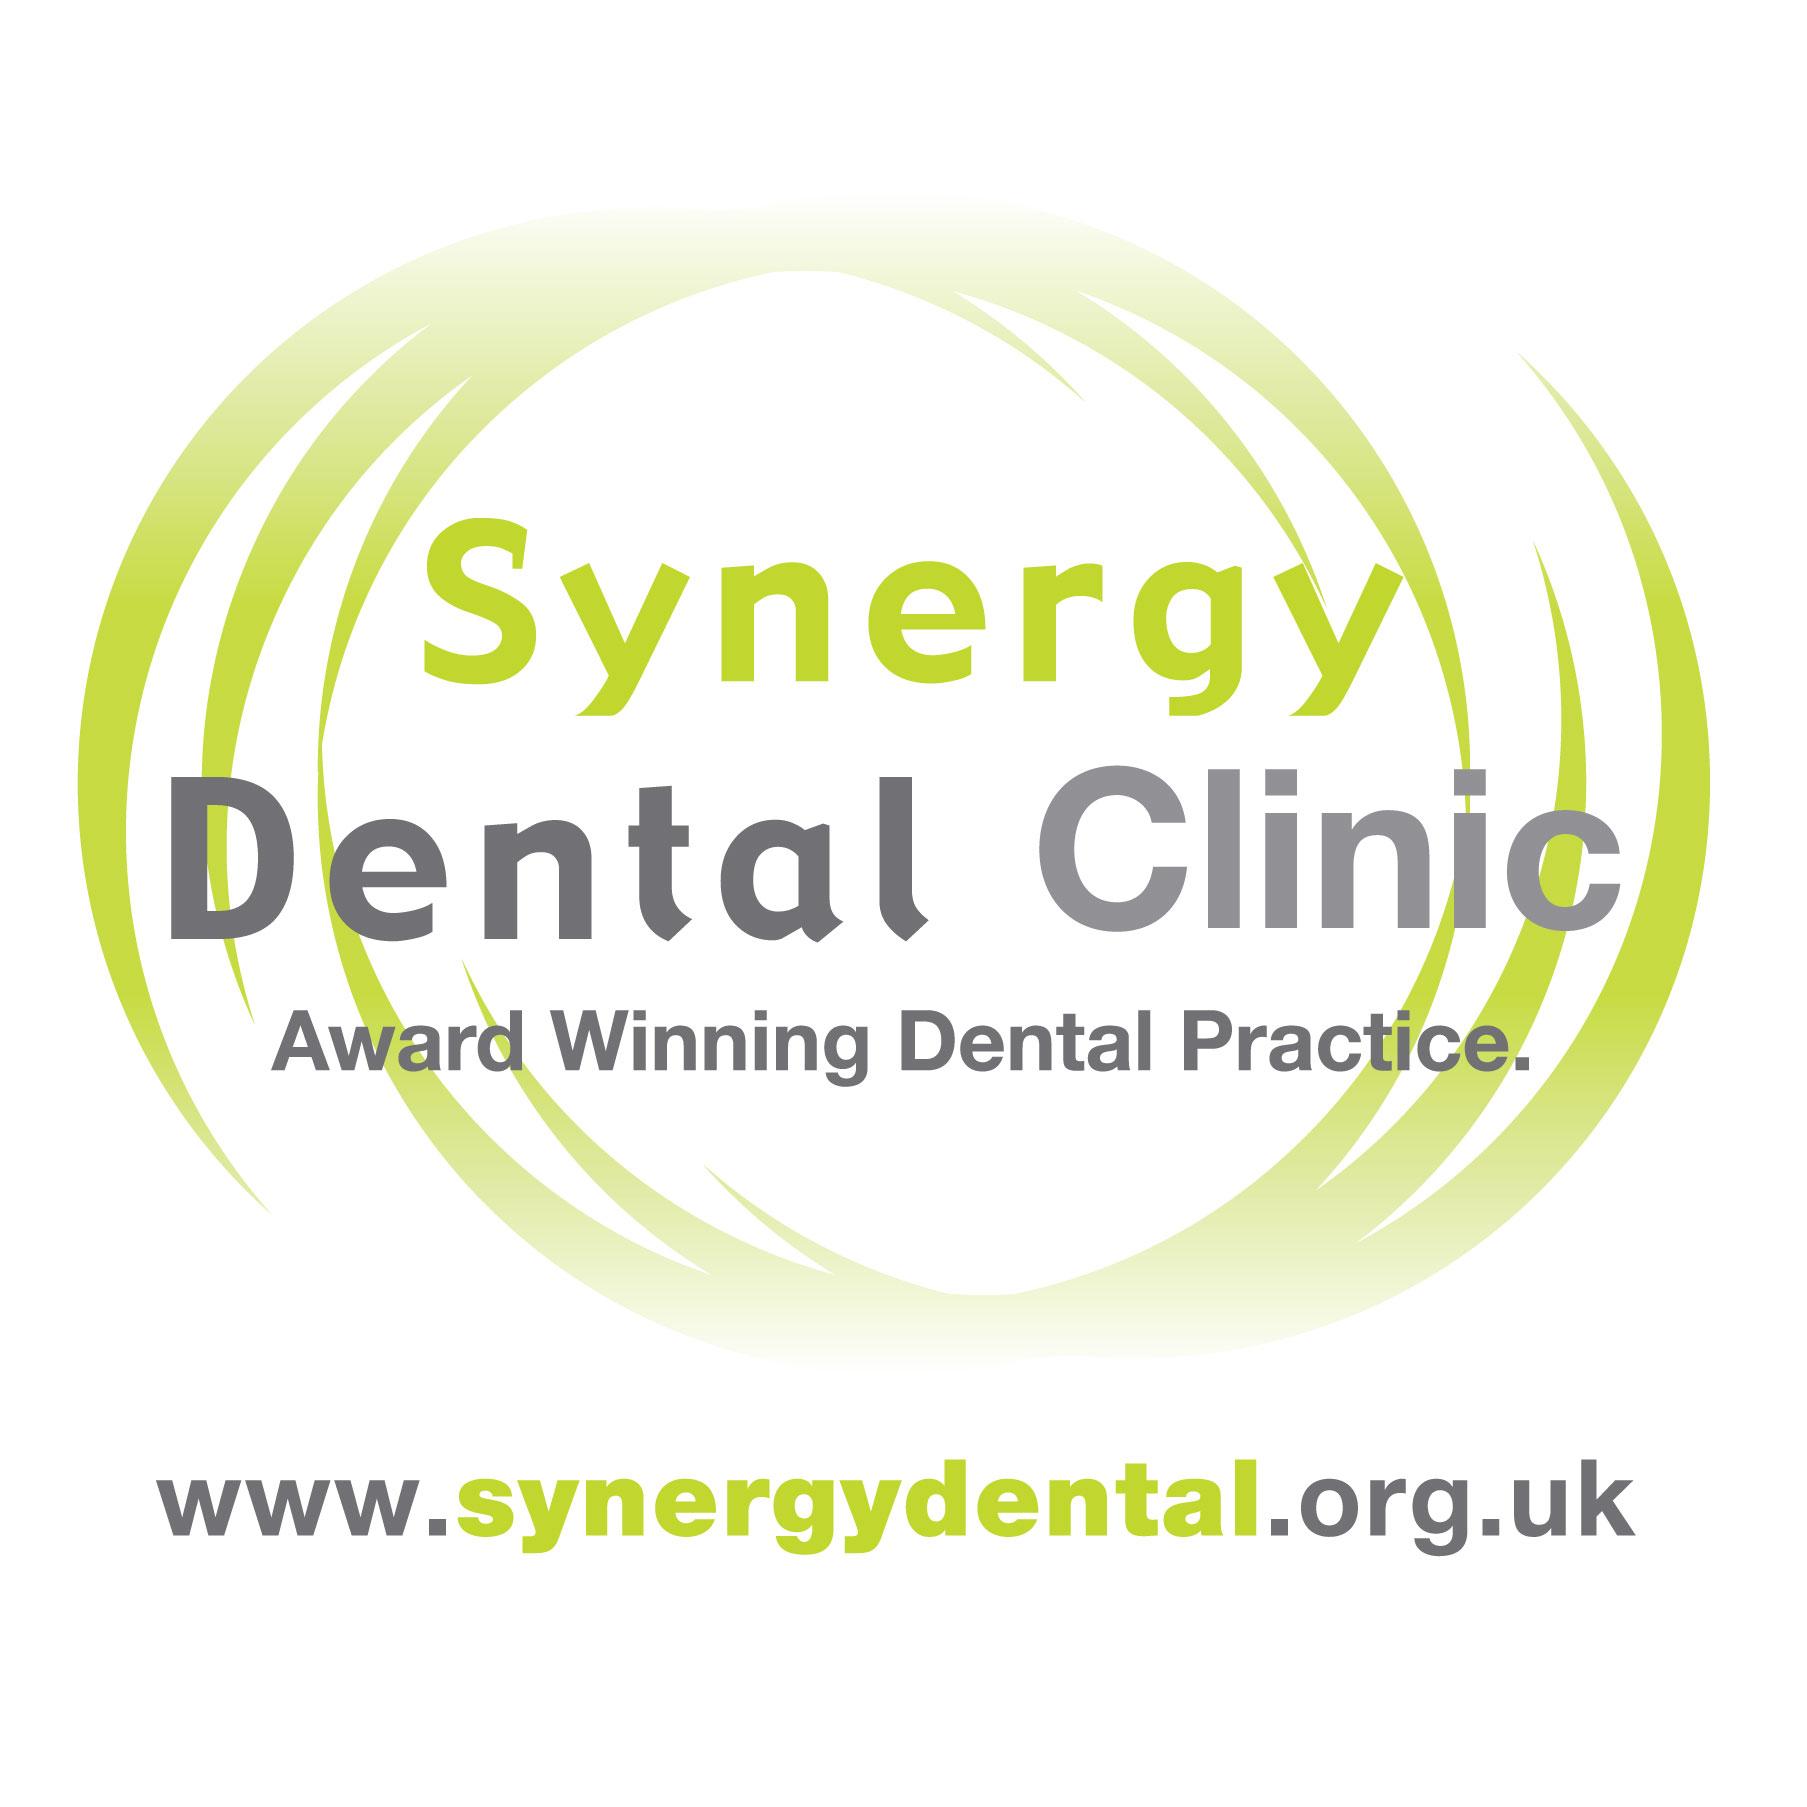 Synergy Dental